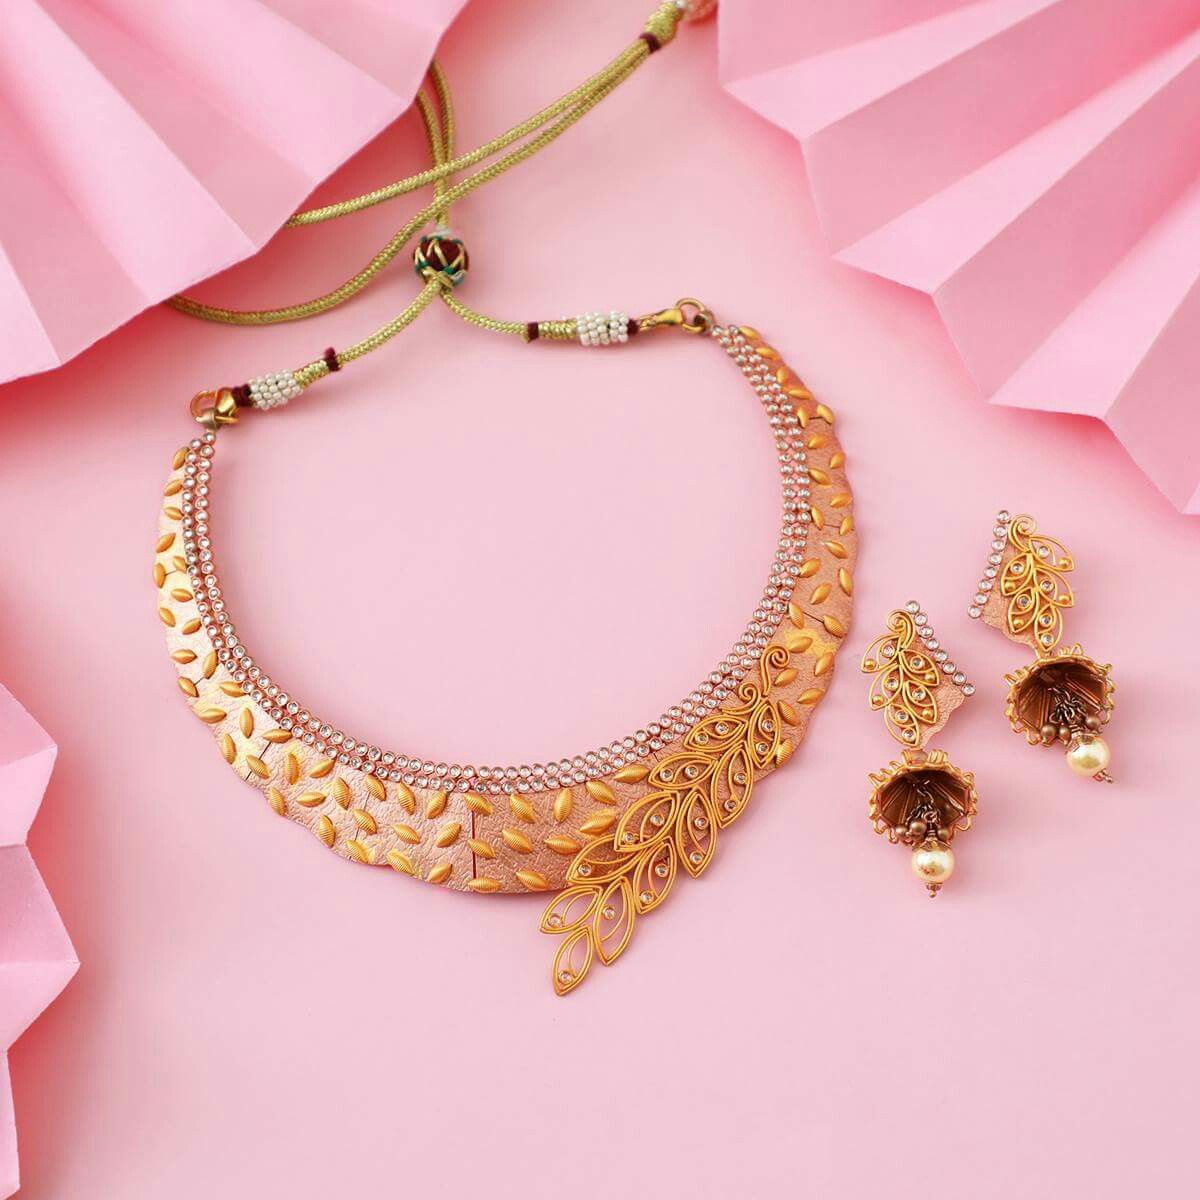 Pin by Rehma Siraj on jewellery | Pinterest | Bangle, Gold and Bvlgari